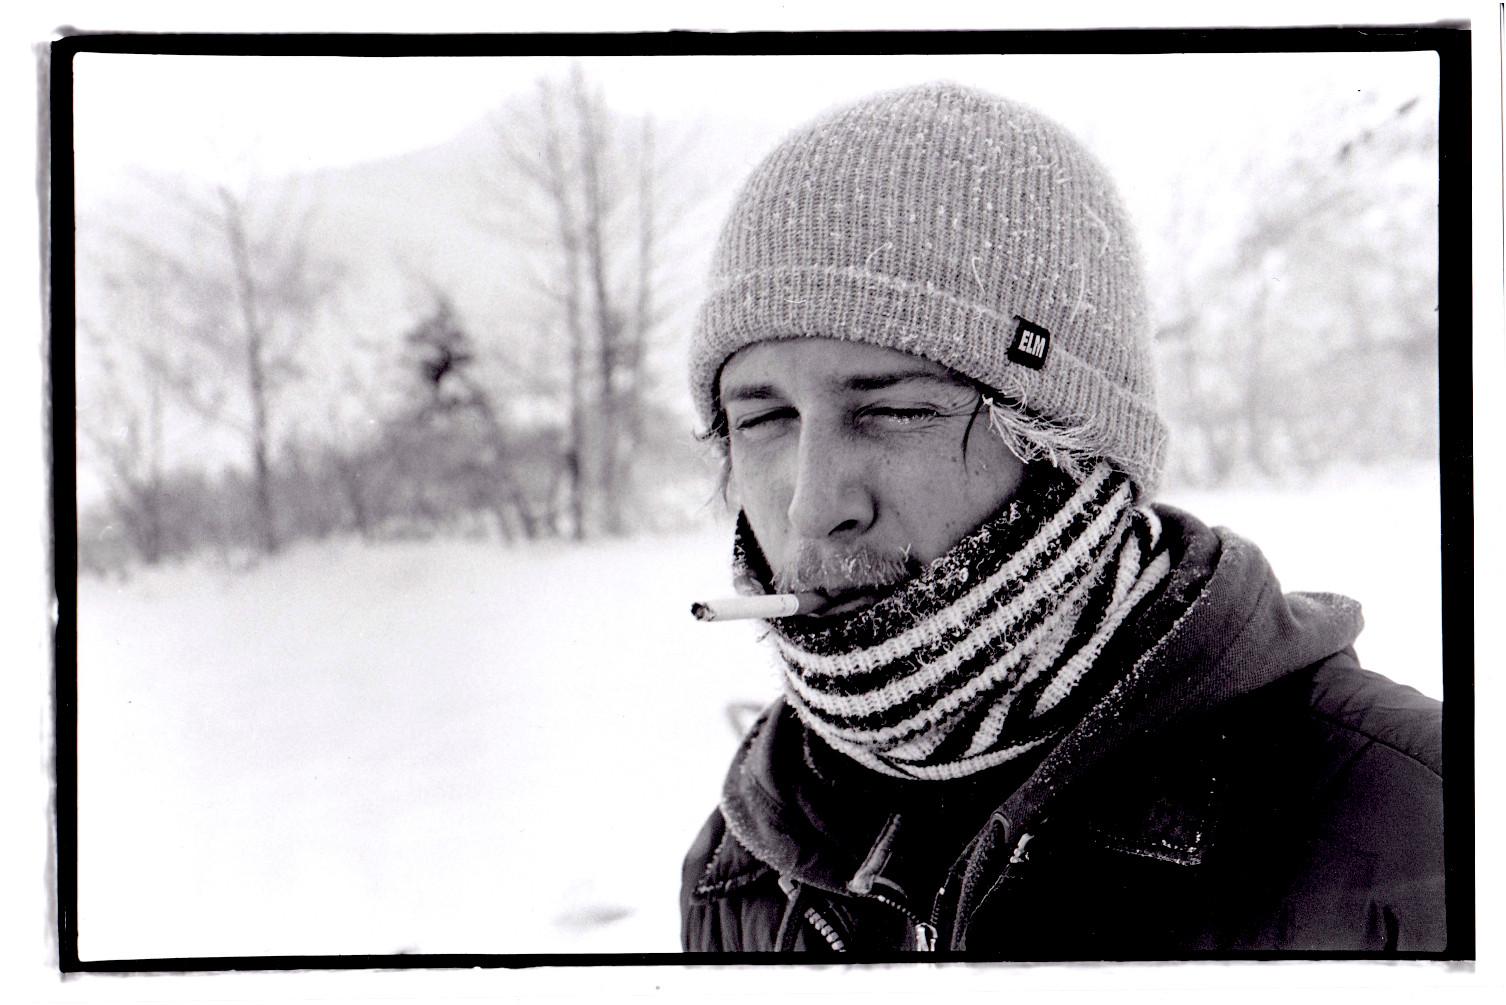 Chris Larson - Turnagain Pass, AK